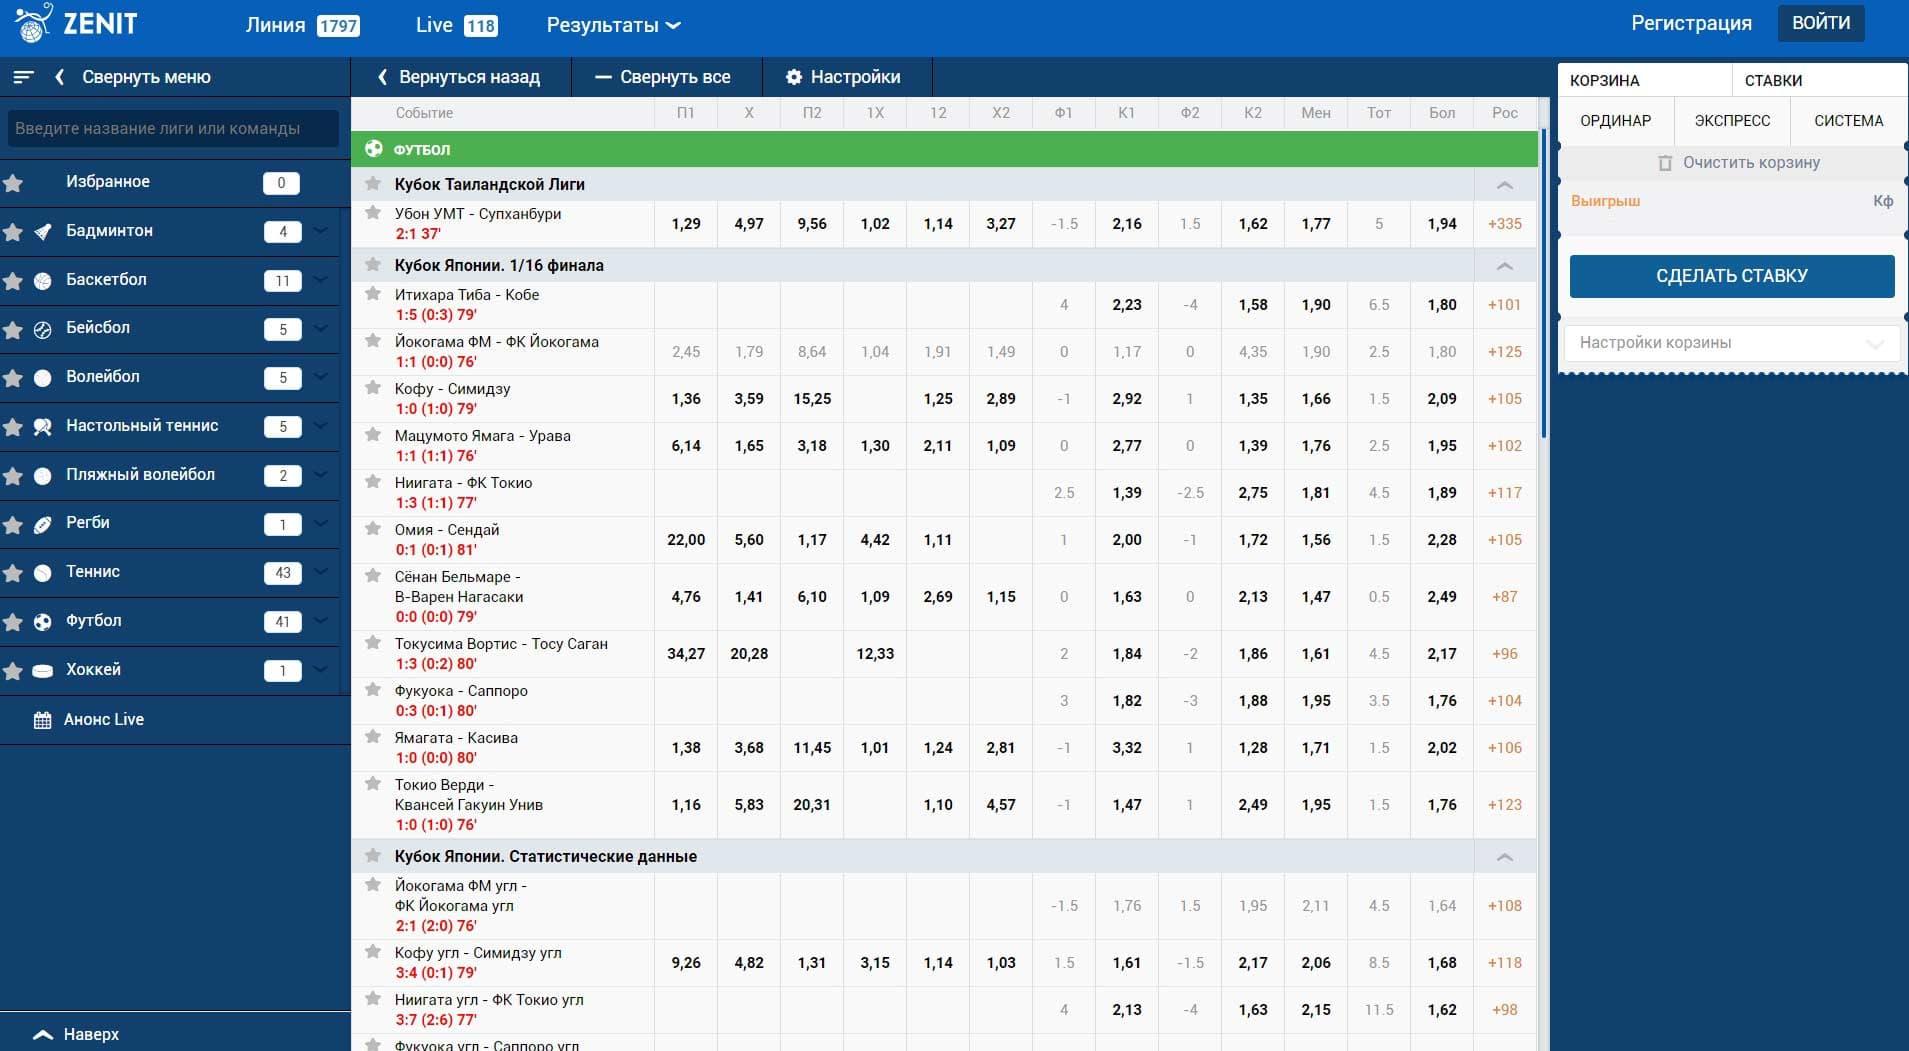 Где смотреть матч динамо москва зенит онлайн